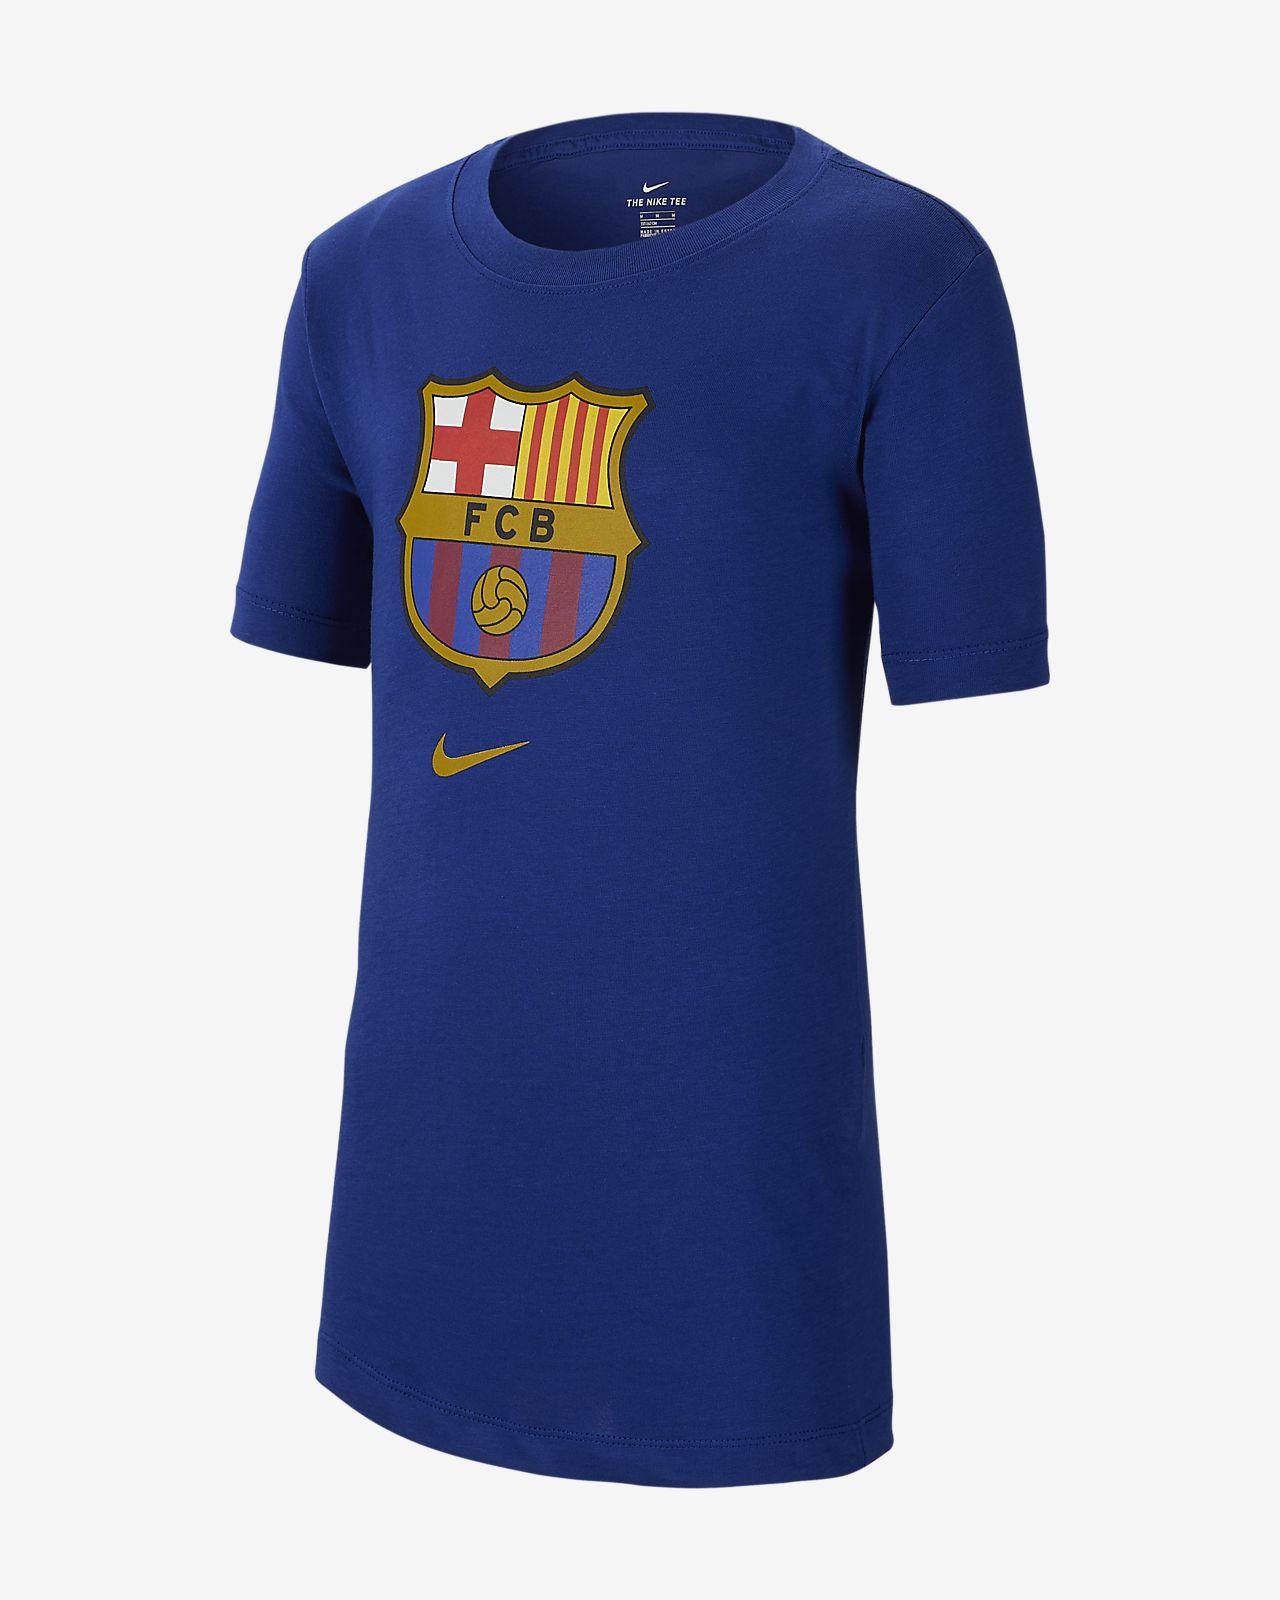 c7e704e7 FC Barcelona T-skjorte til store barn. Nike.com NO